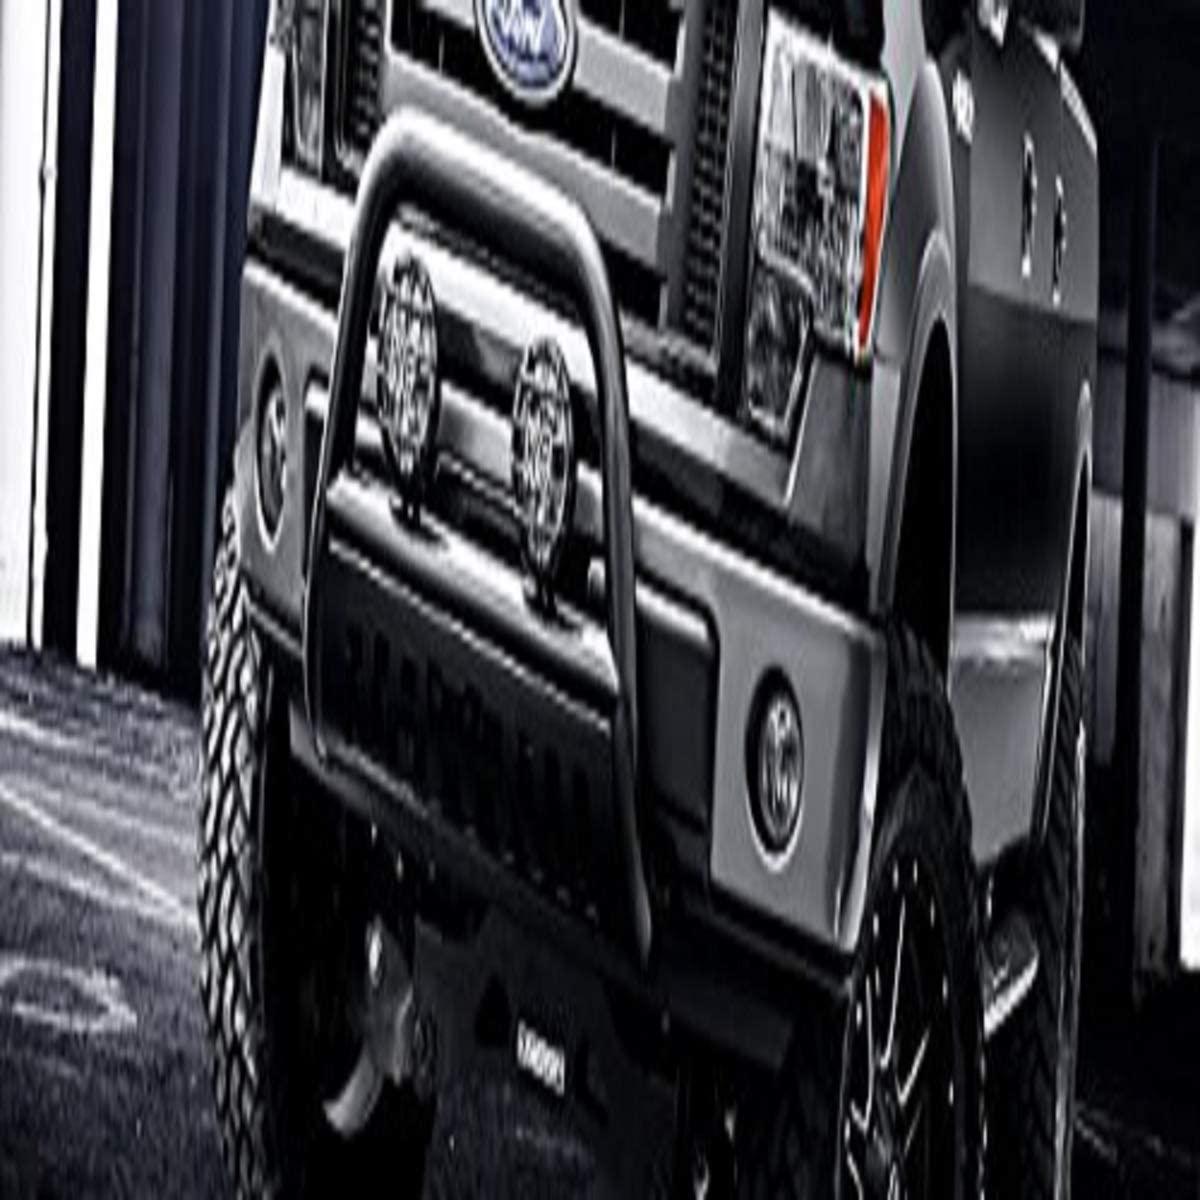 R&L Racing Matte Black Heavy Duty Steel Bull Bar 2010-2015 for Dodge Ram 2500/3500 Brush Push Front Bumper Grill Grille Guard